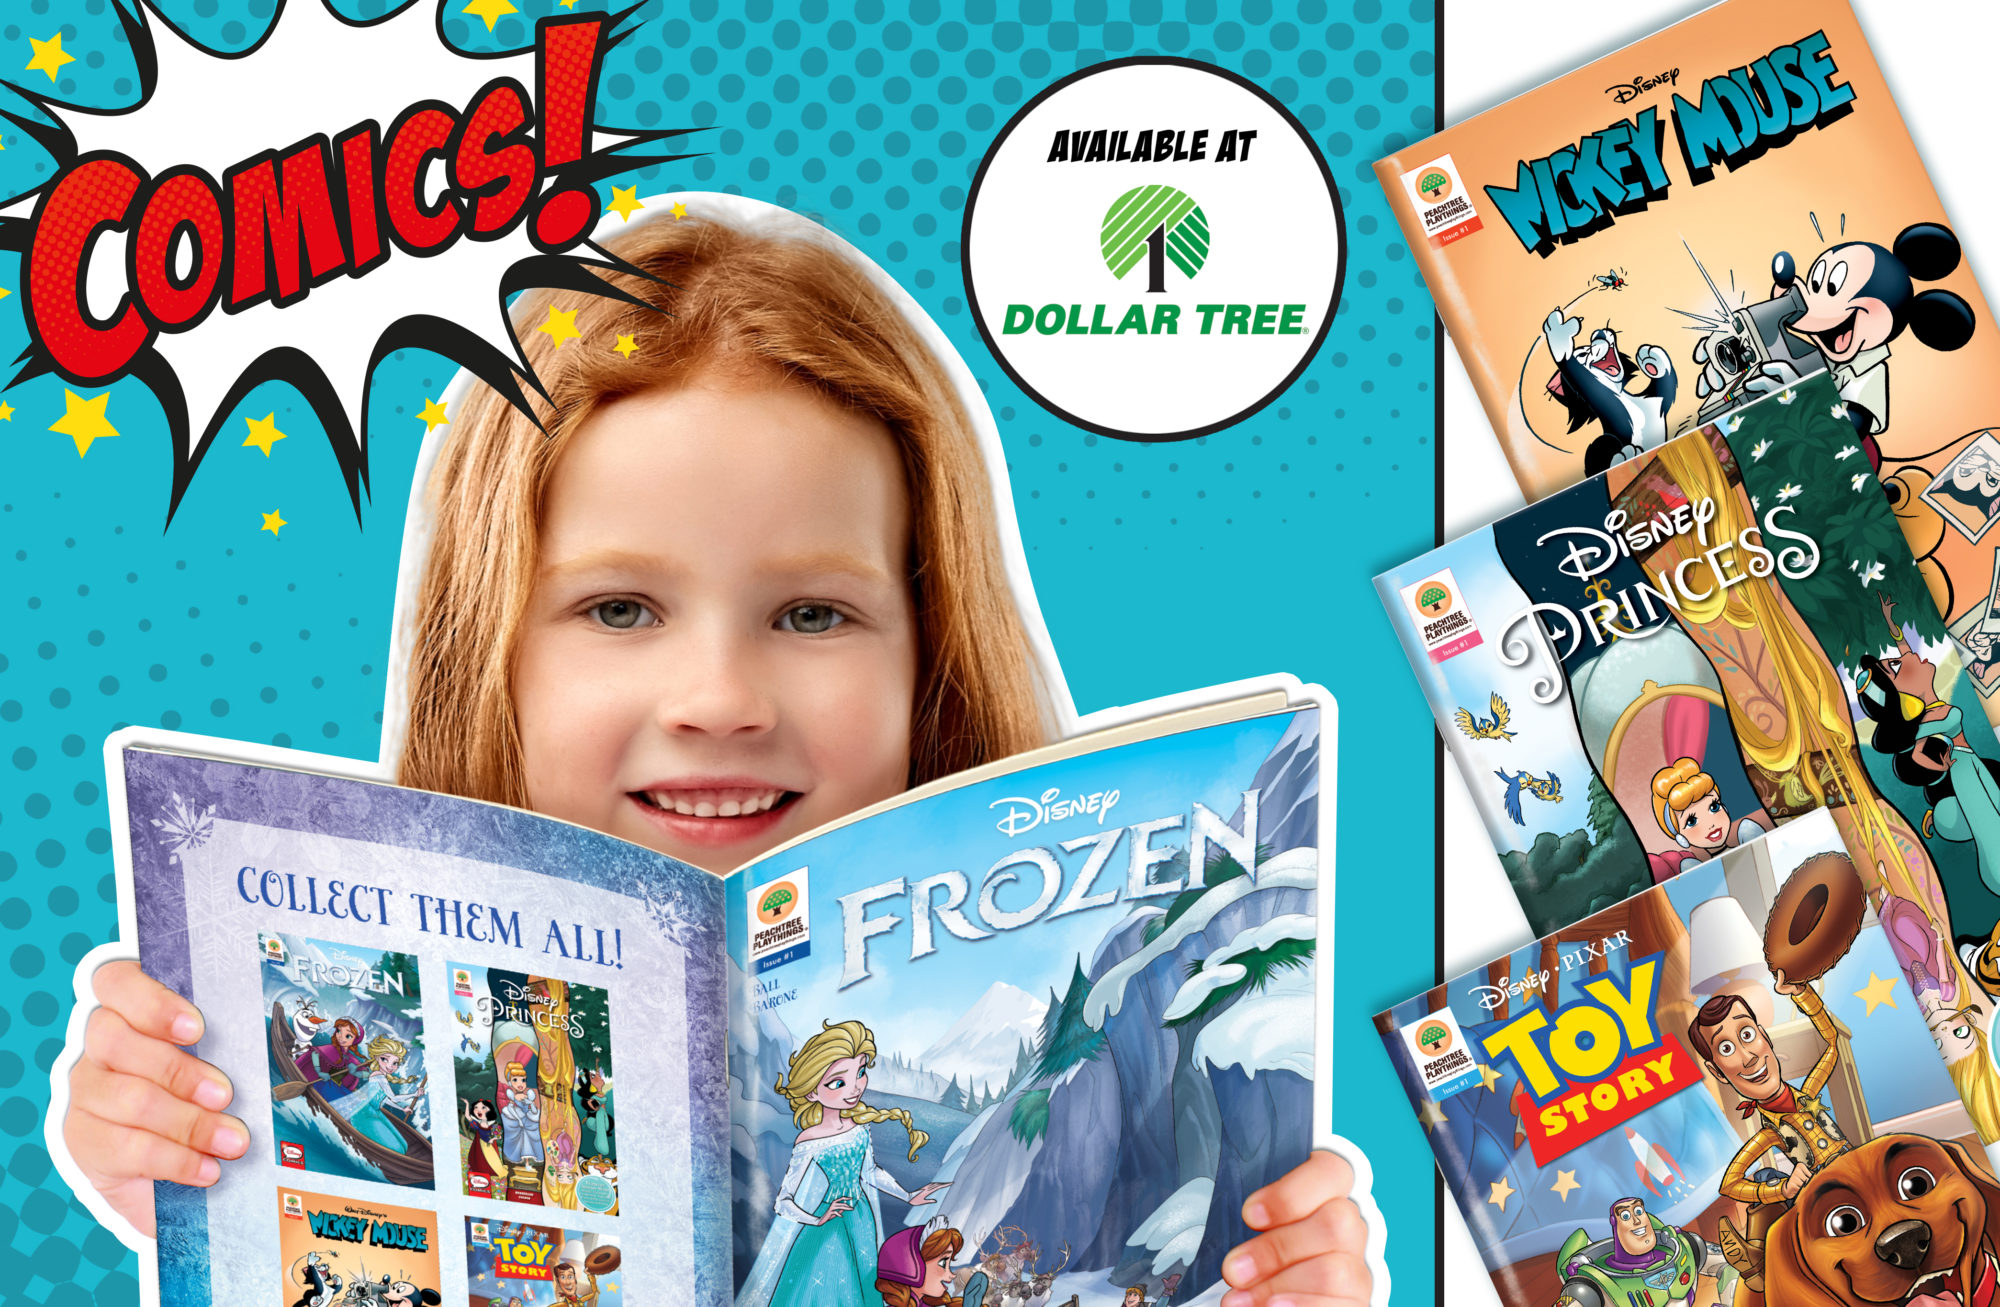 Comic Books at Dollar Tree